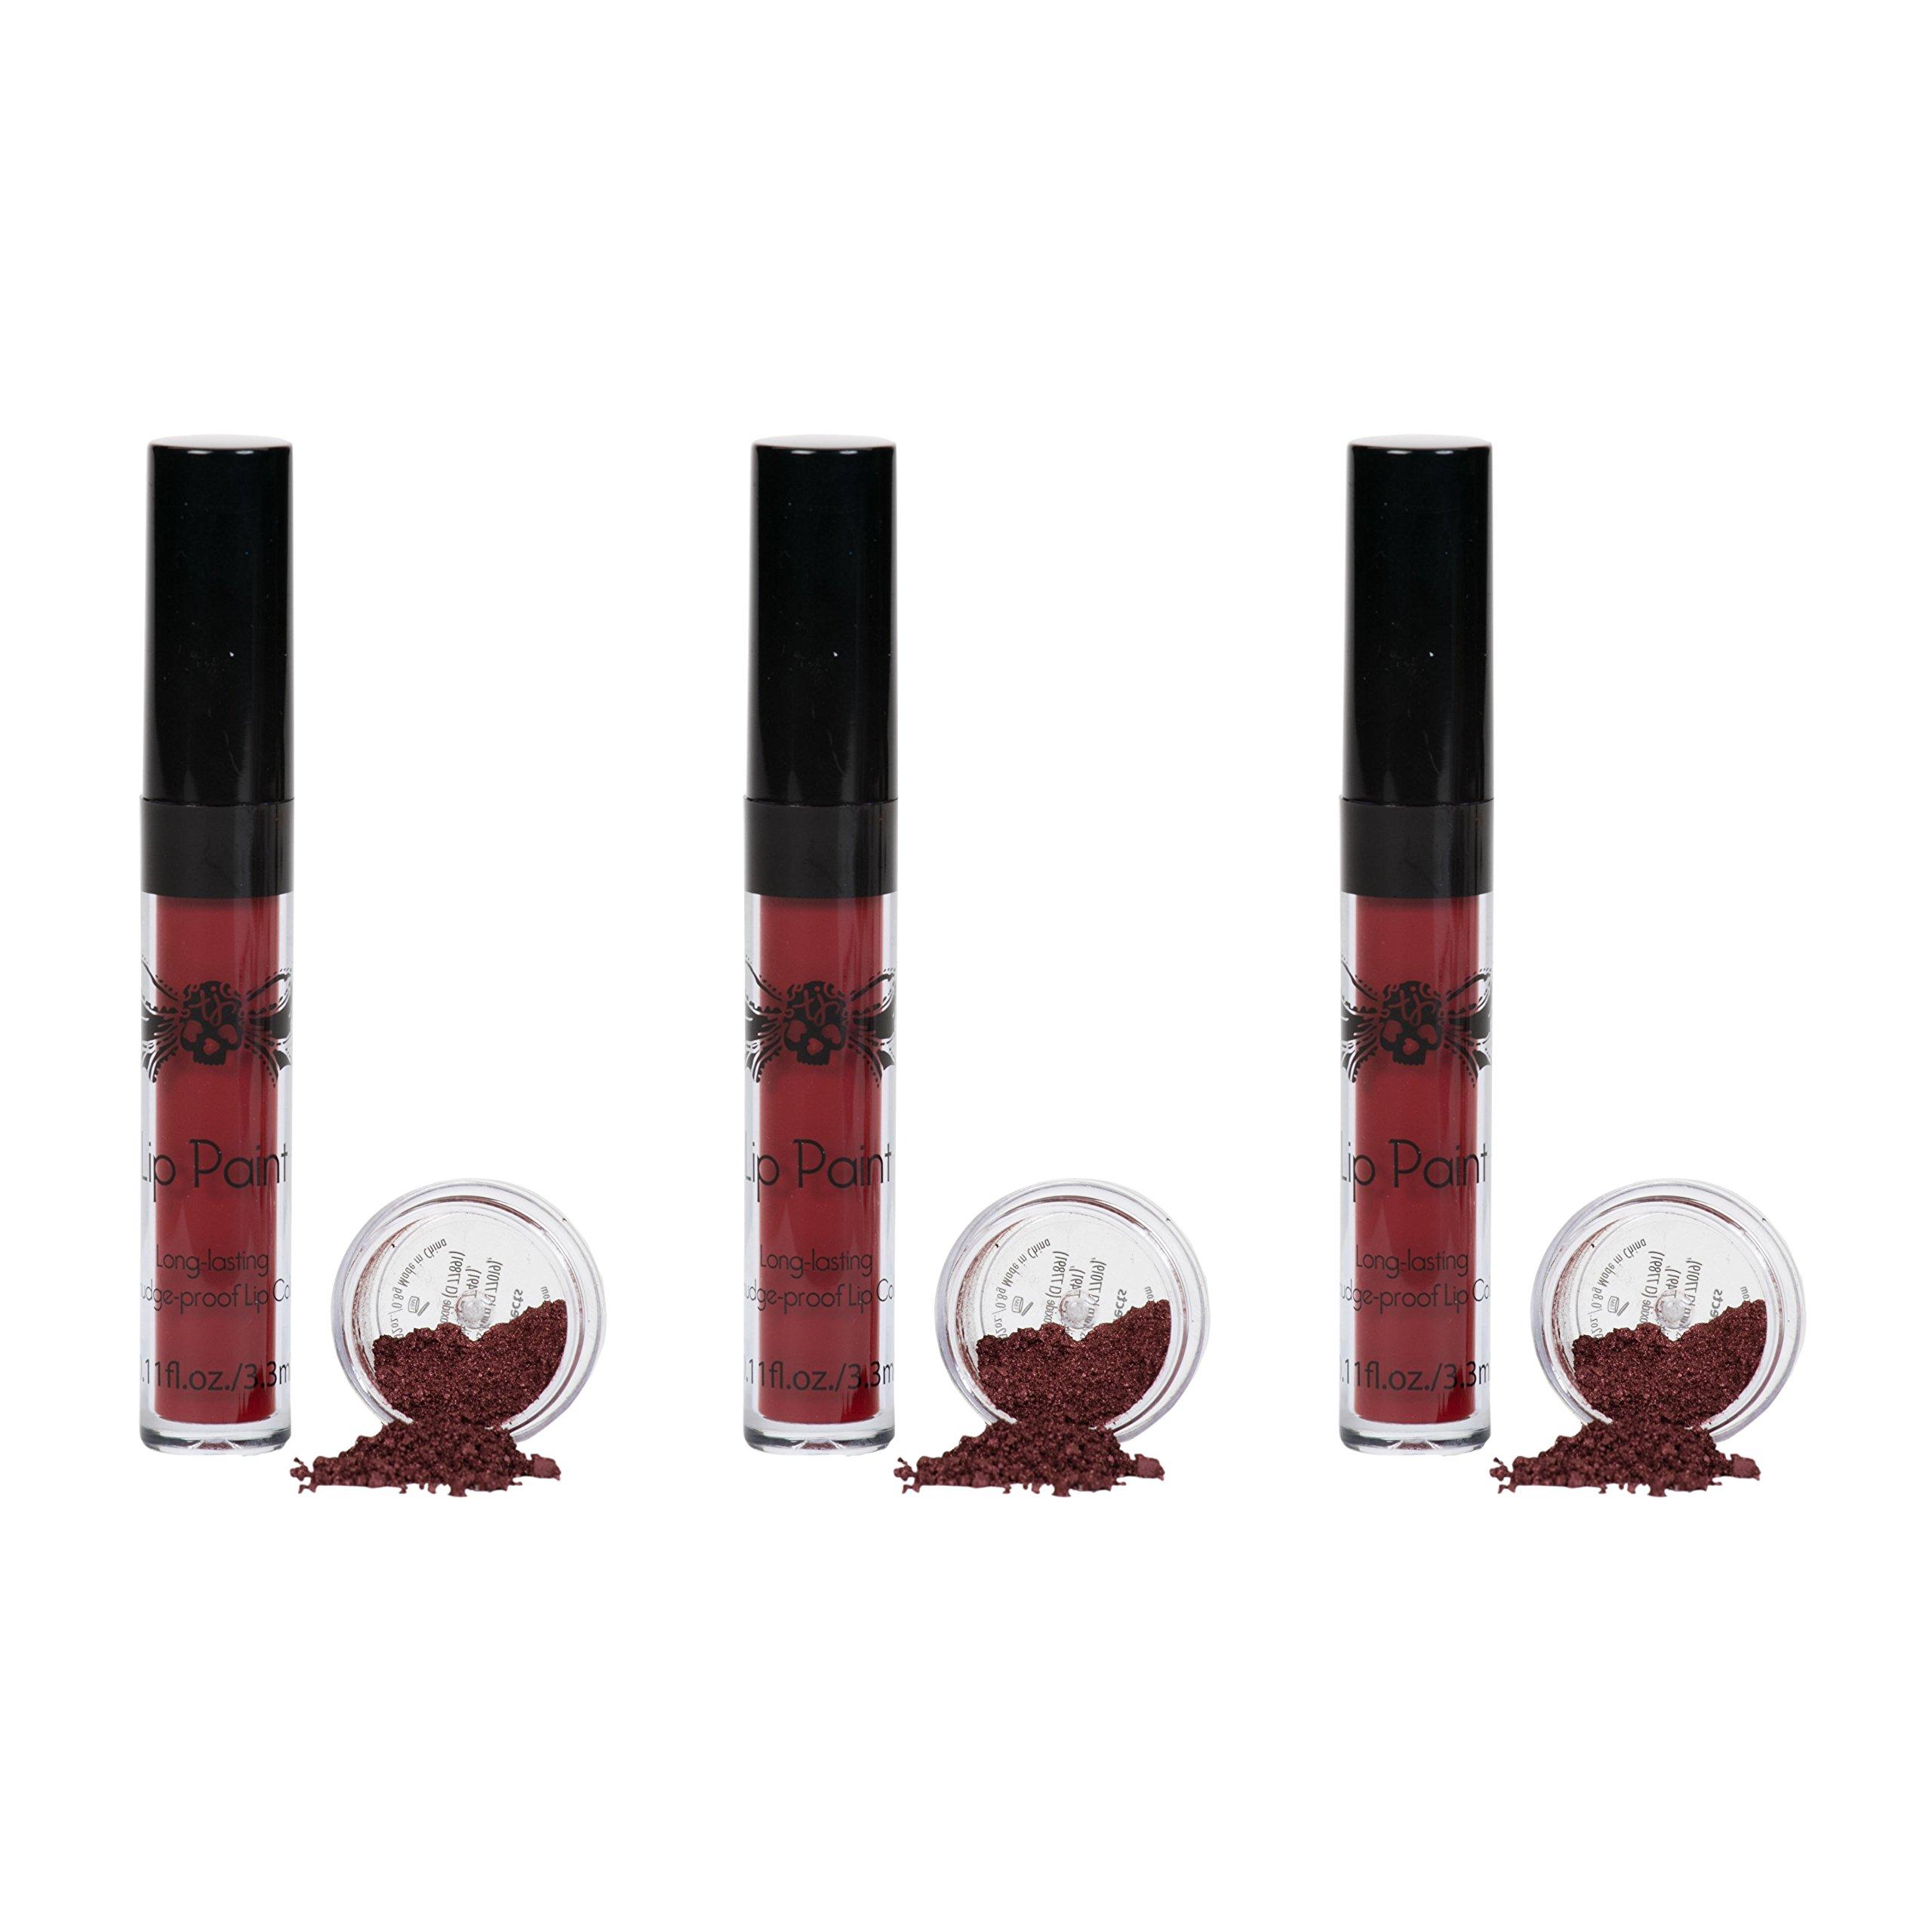 Tattoo Junkee Rebel Lip Kit Bundle - includes 3 Red Long Lasting Liquid Lipsticks + Shimmer Lip Effects, Pack of 3